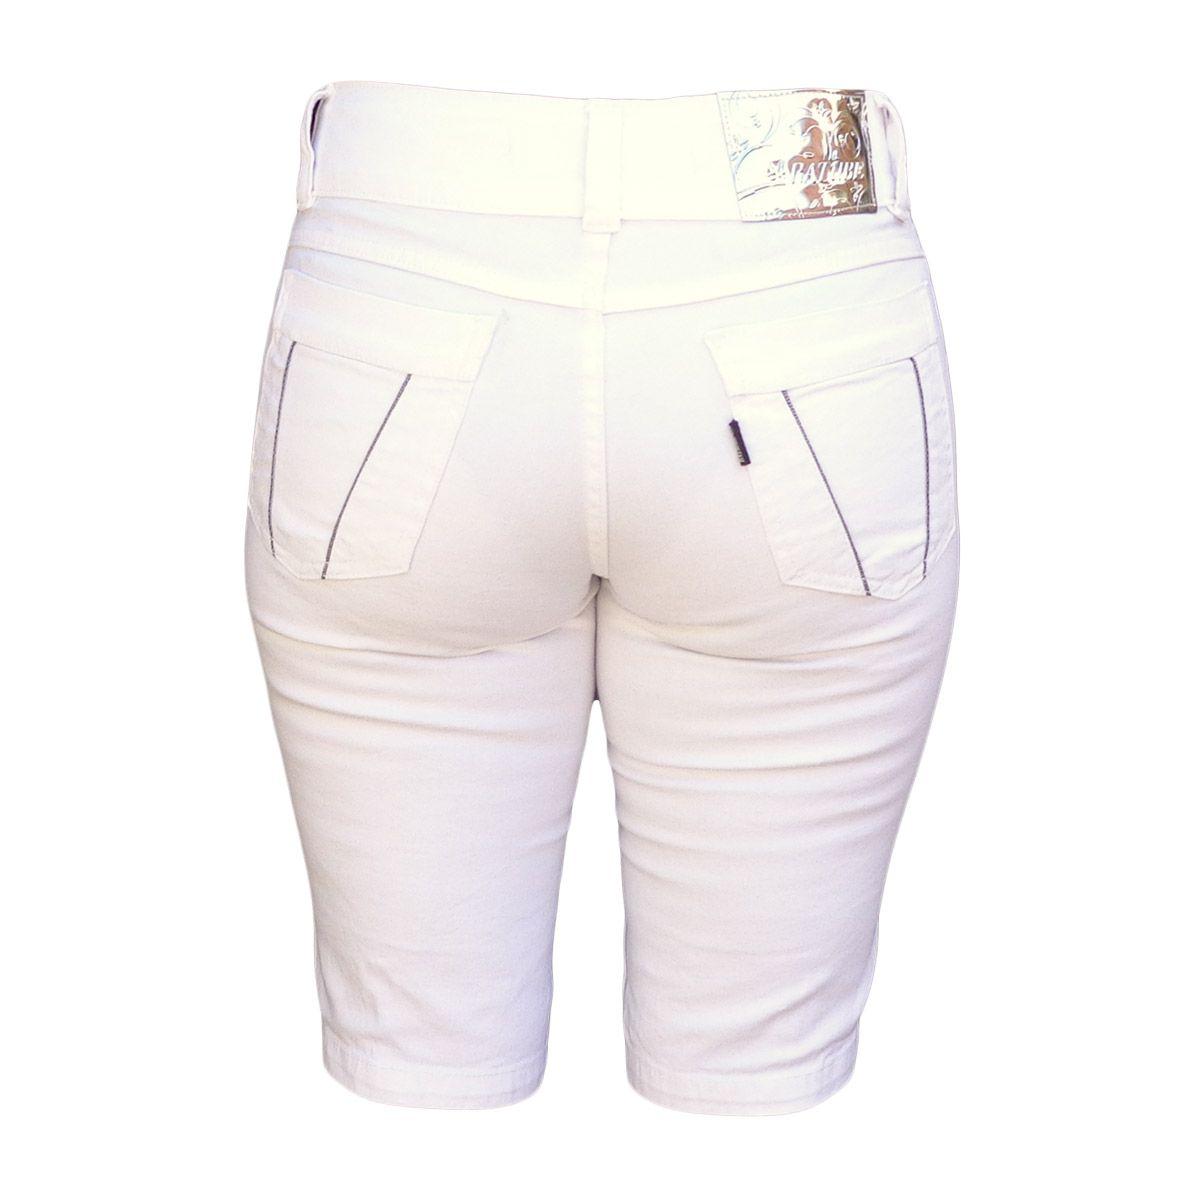 Bermuda Ciclista Feminina Branca Cintura Alta Tamanho 36